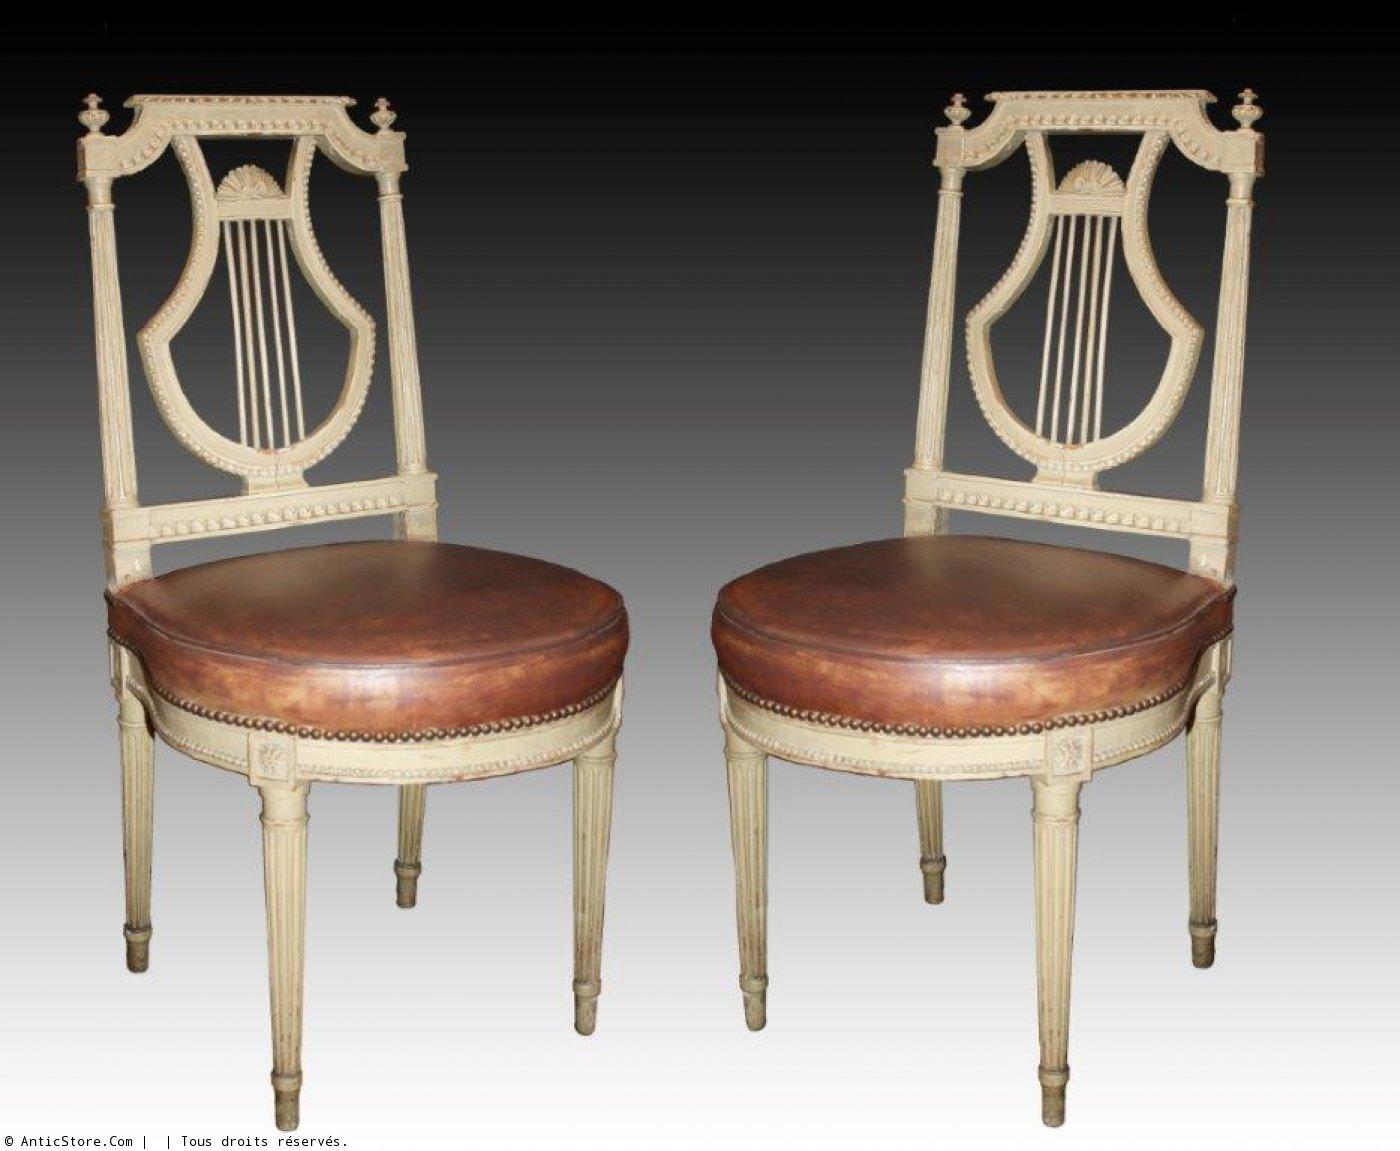 Mobilier de salle manger en bois laqu xviiie si cle for Salle a manger mobilier